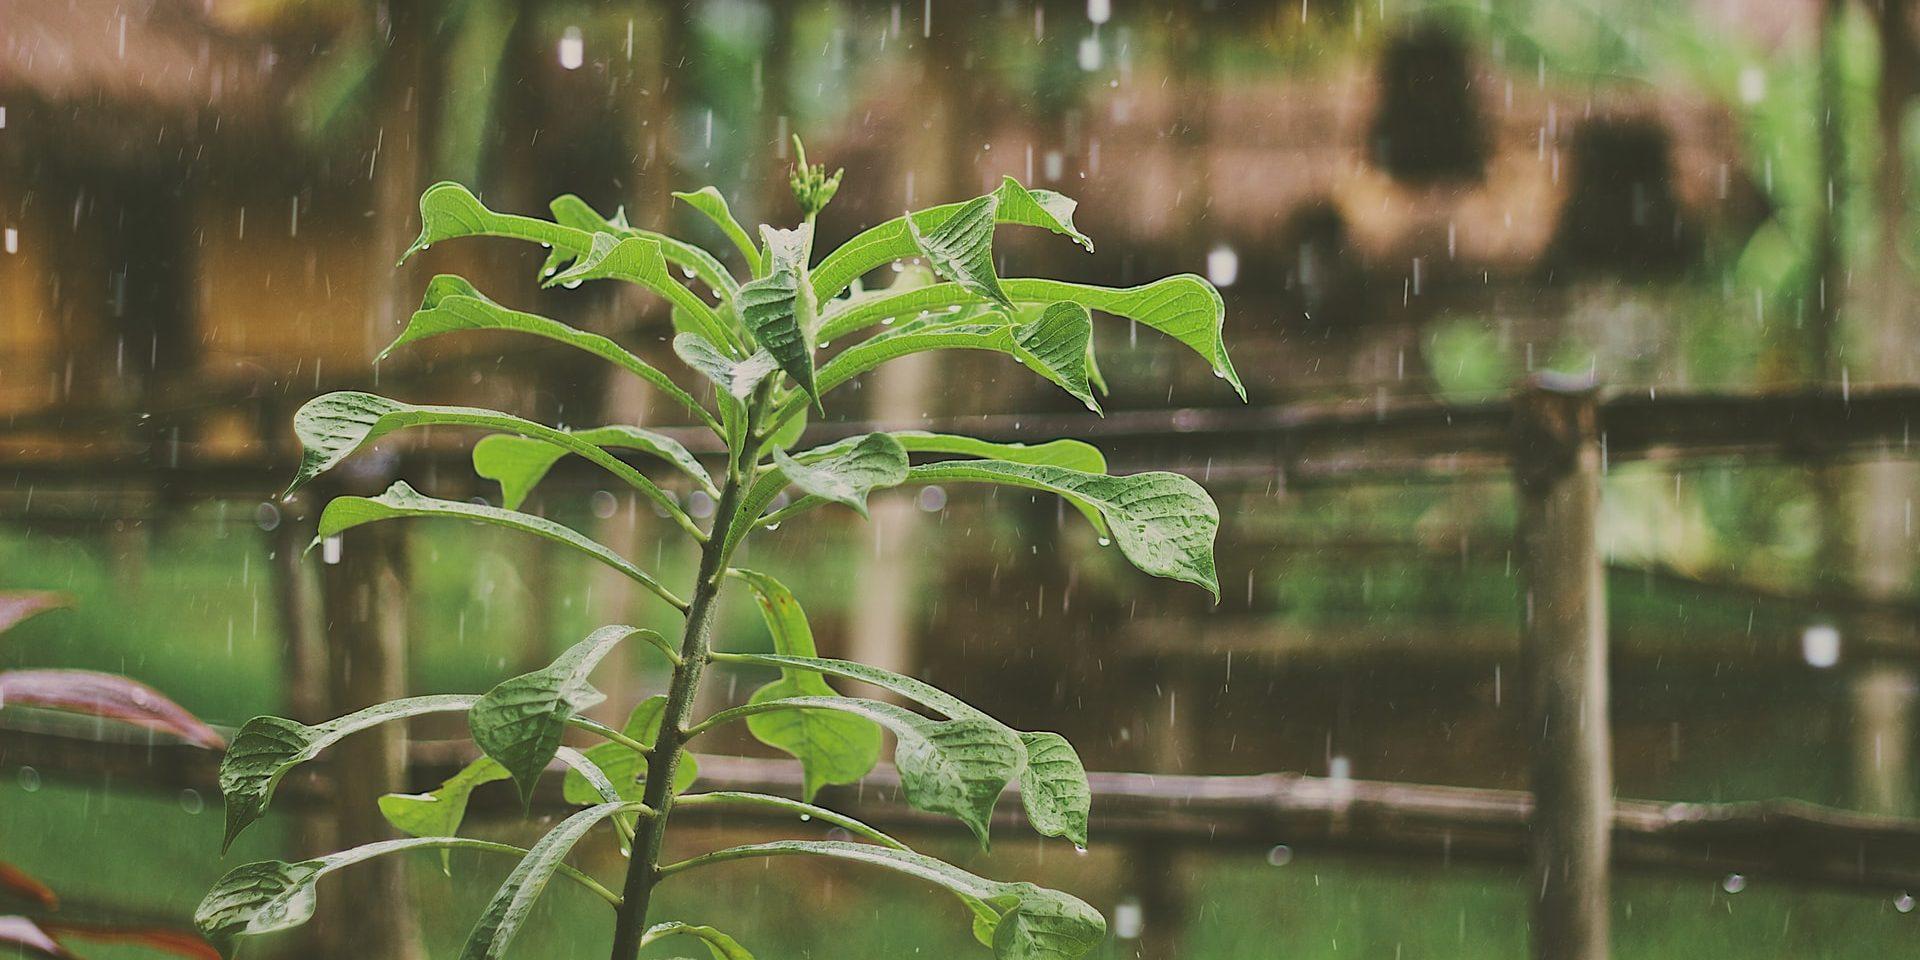 Raindrops on a plant